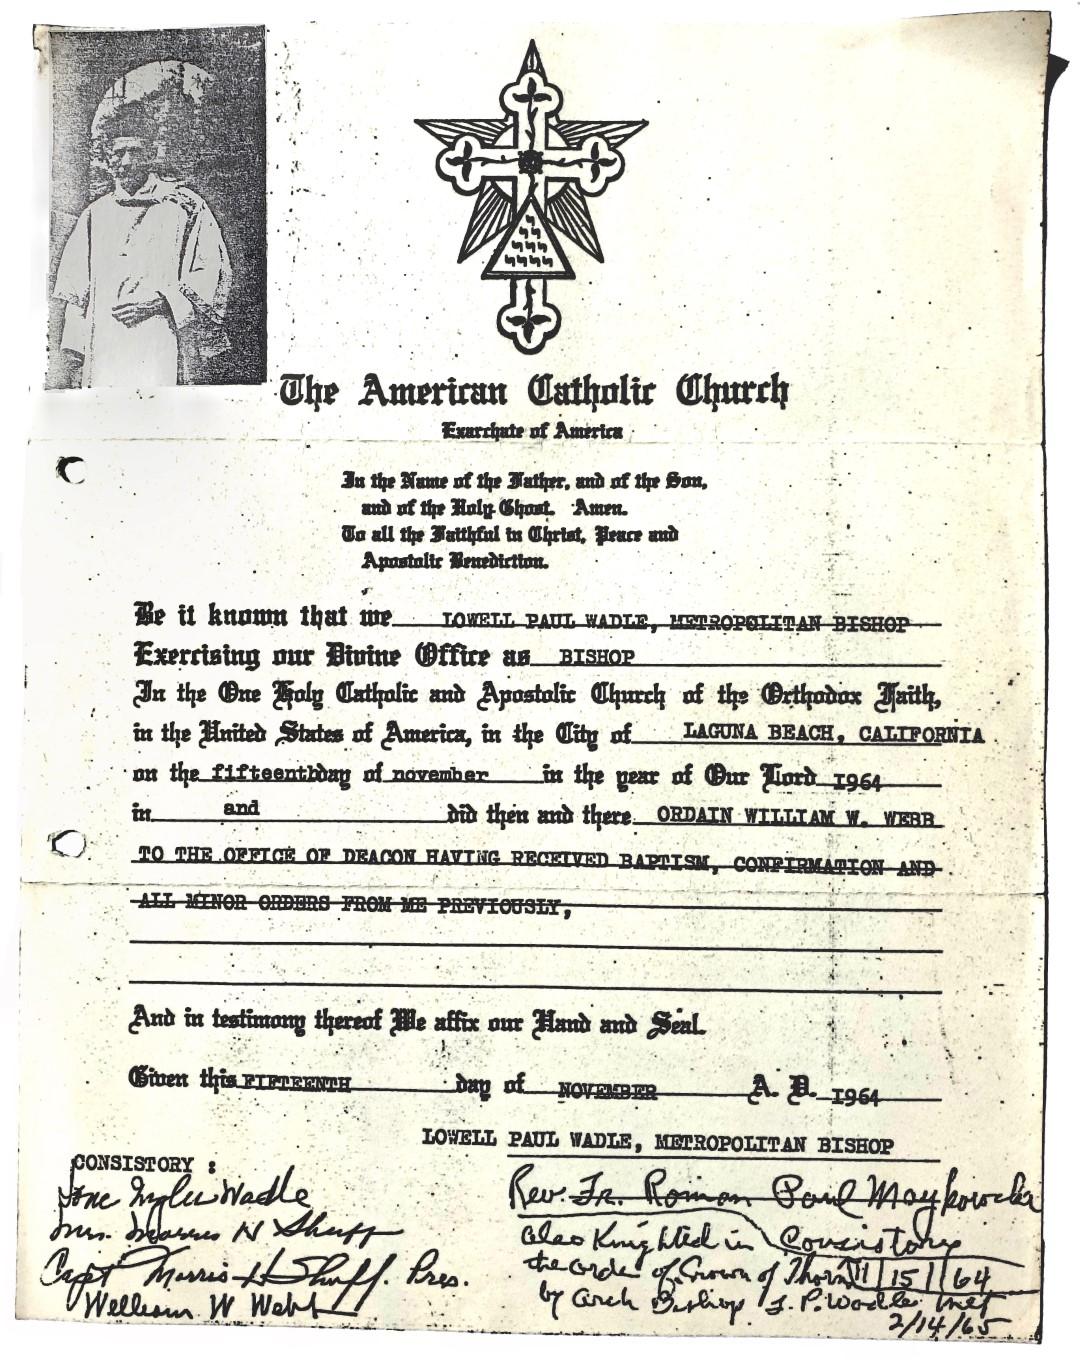 The American Catholic Church William Wallace Webb Lowell Paul Wadle